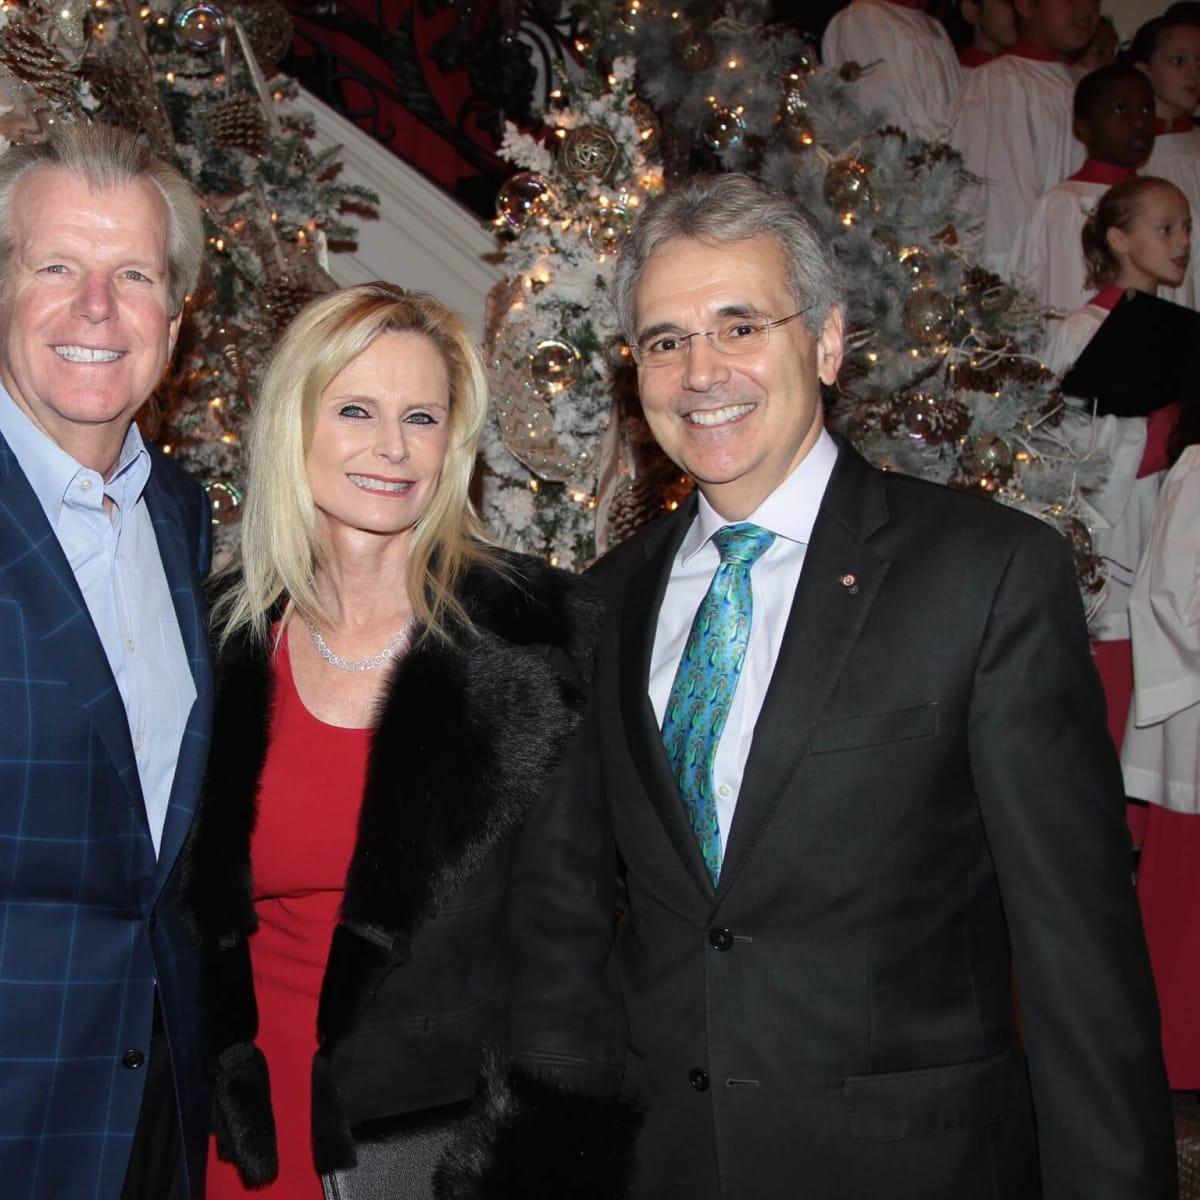 MD Anderson Santa's Elves party, Gregg Falgout, Jo Lynn Falgout, Ron DePinho